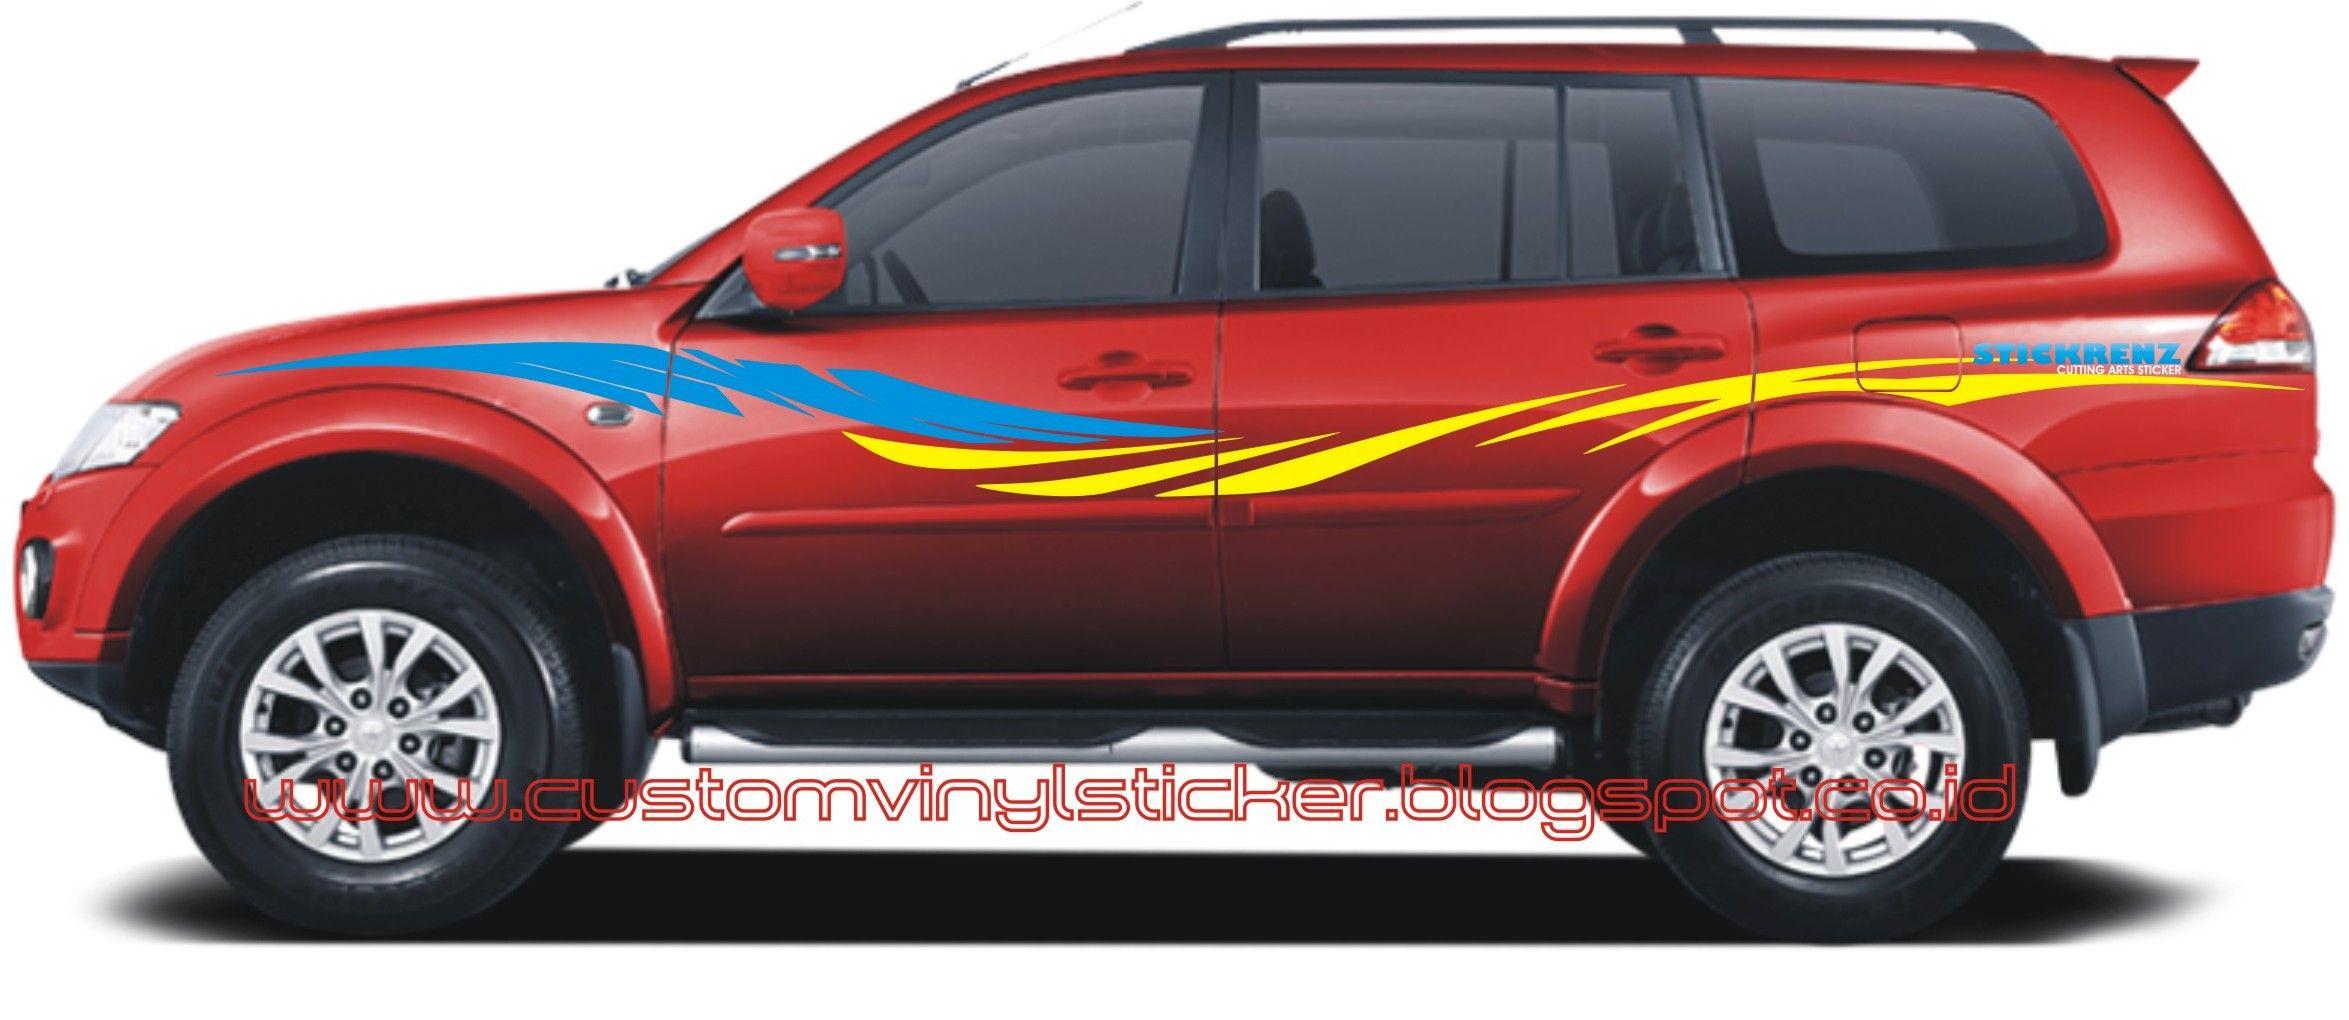 Red car sticker design - Mitsubishi Pajero Sport Red Custom Stripe Sticker Concept Mitsubishi Pajero Customsticker